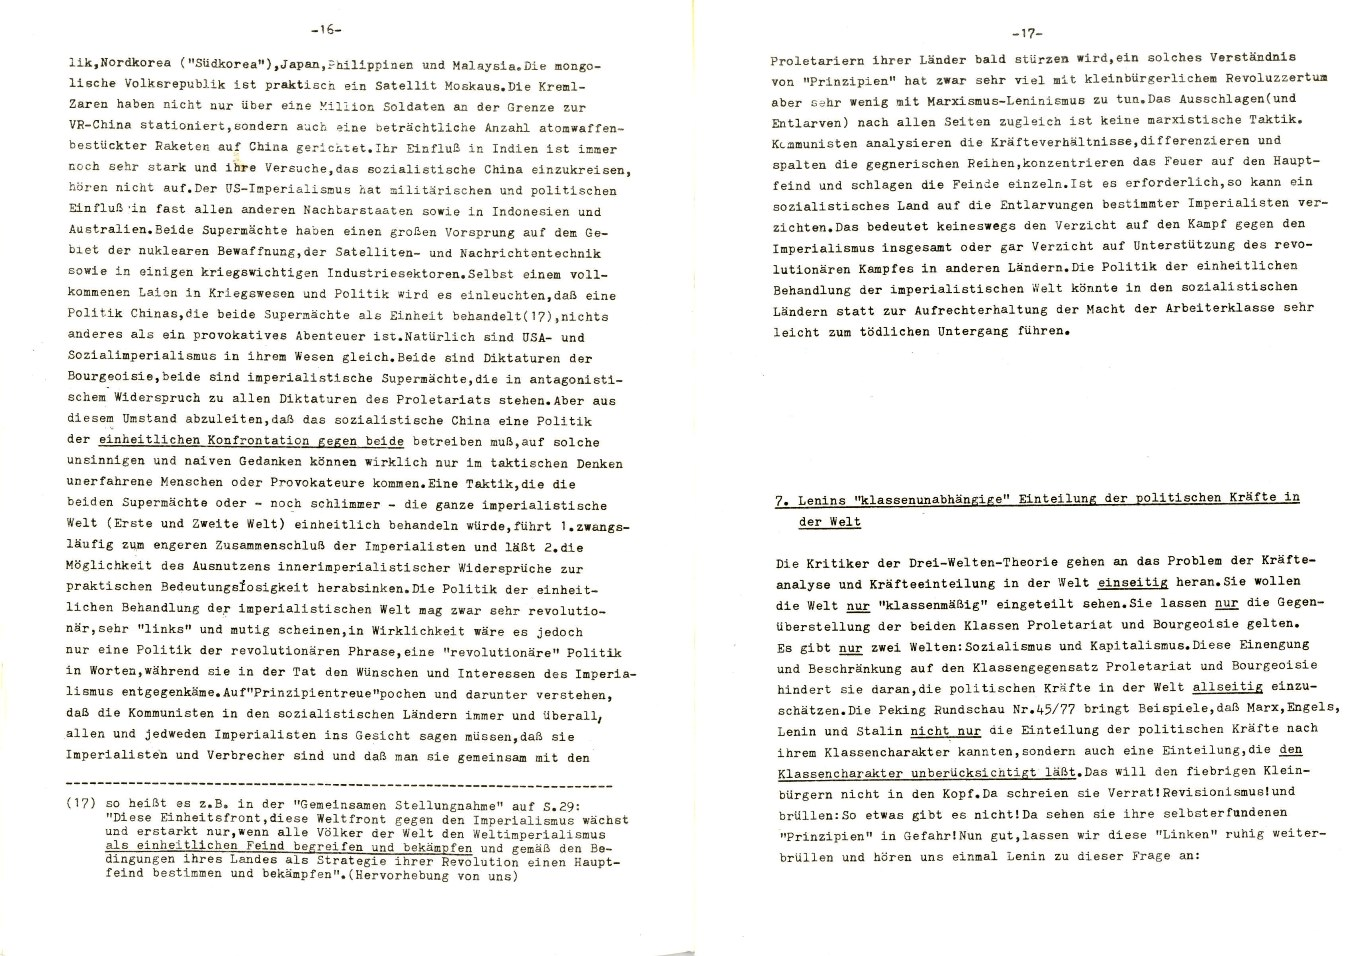 Muenchen_Kampf_dem_Revisionismus_1978_04_05_10